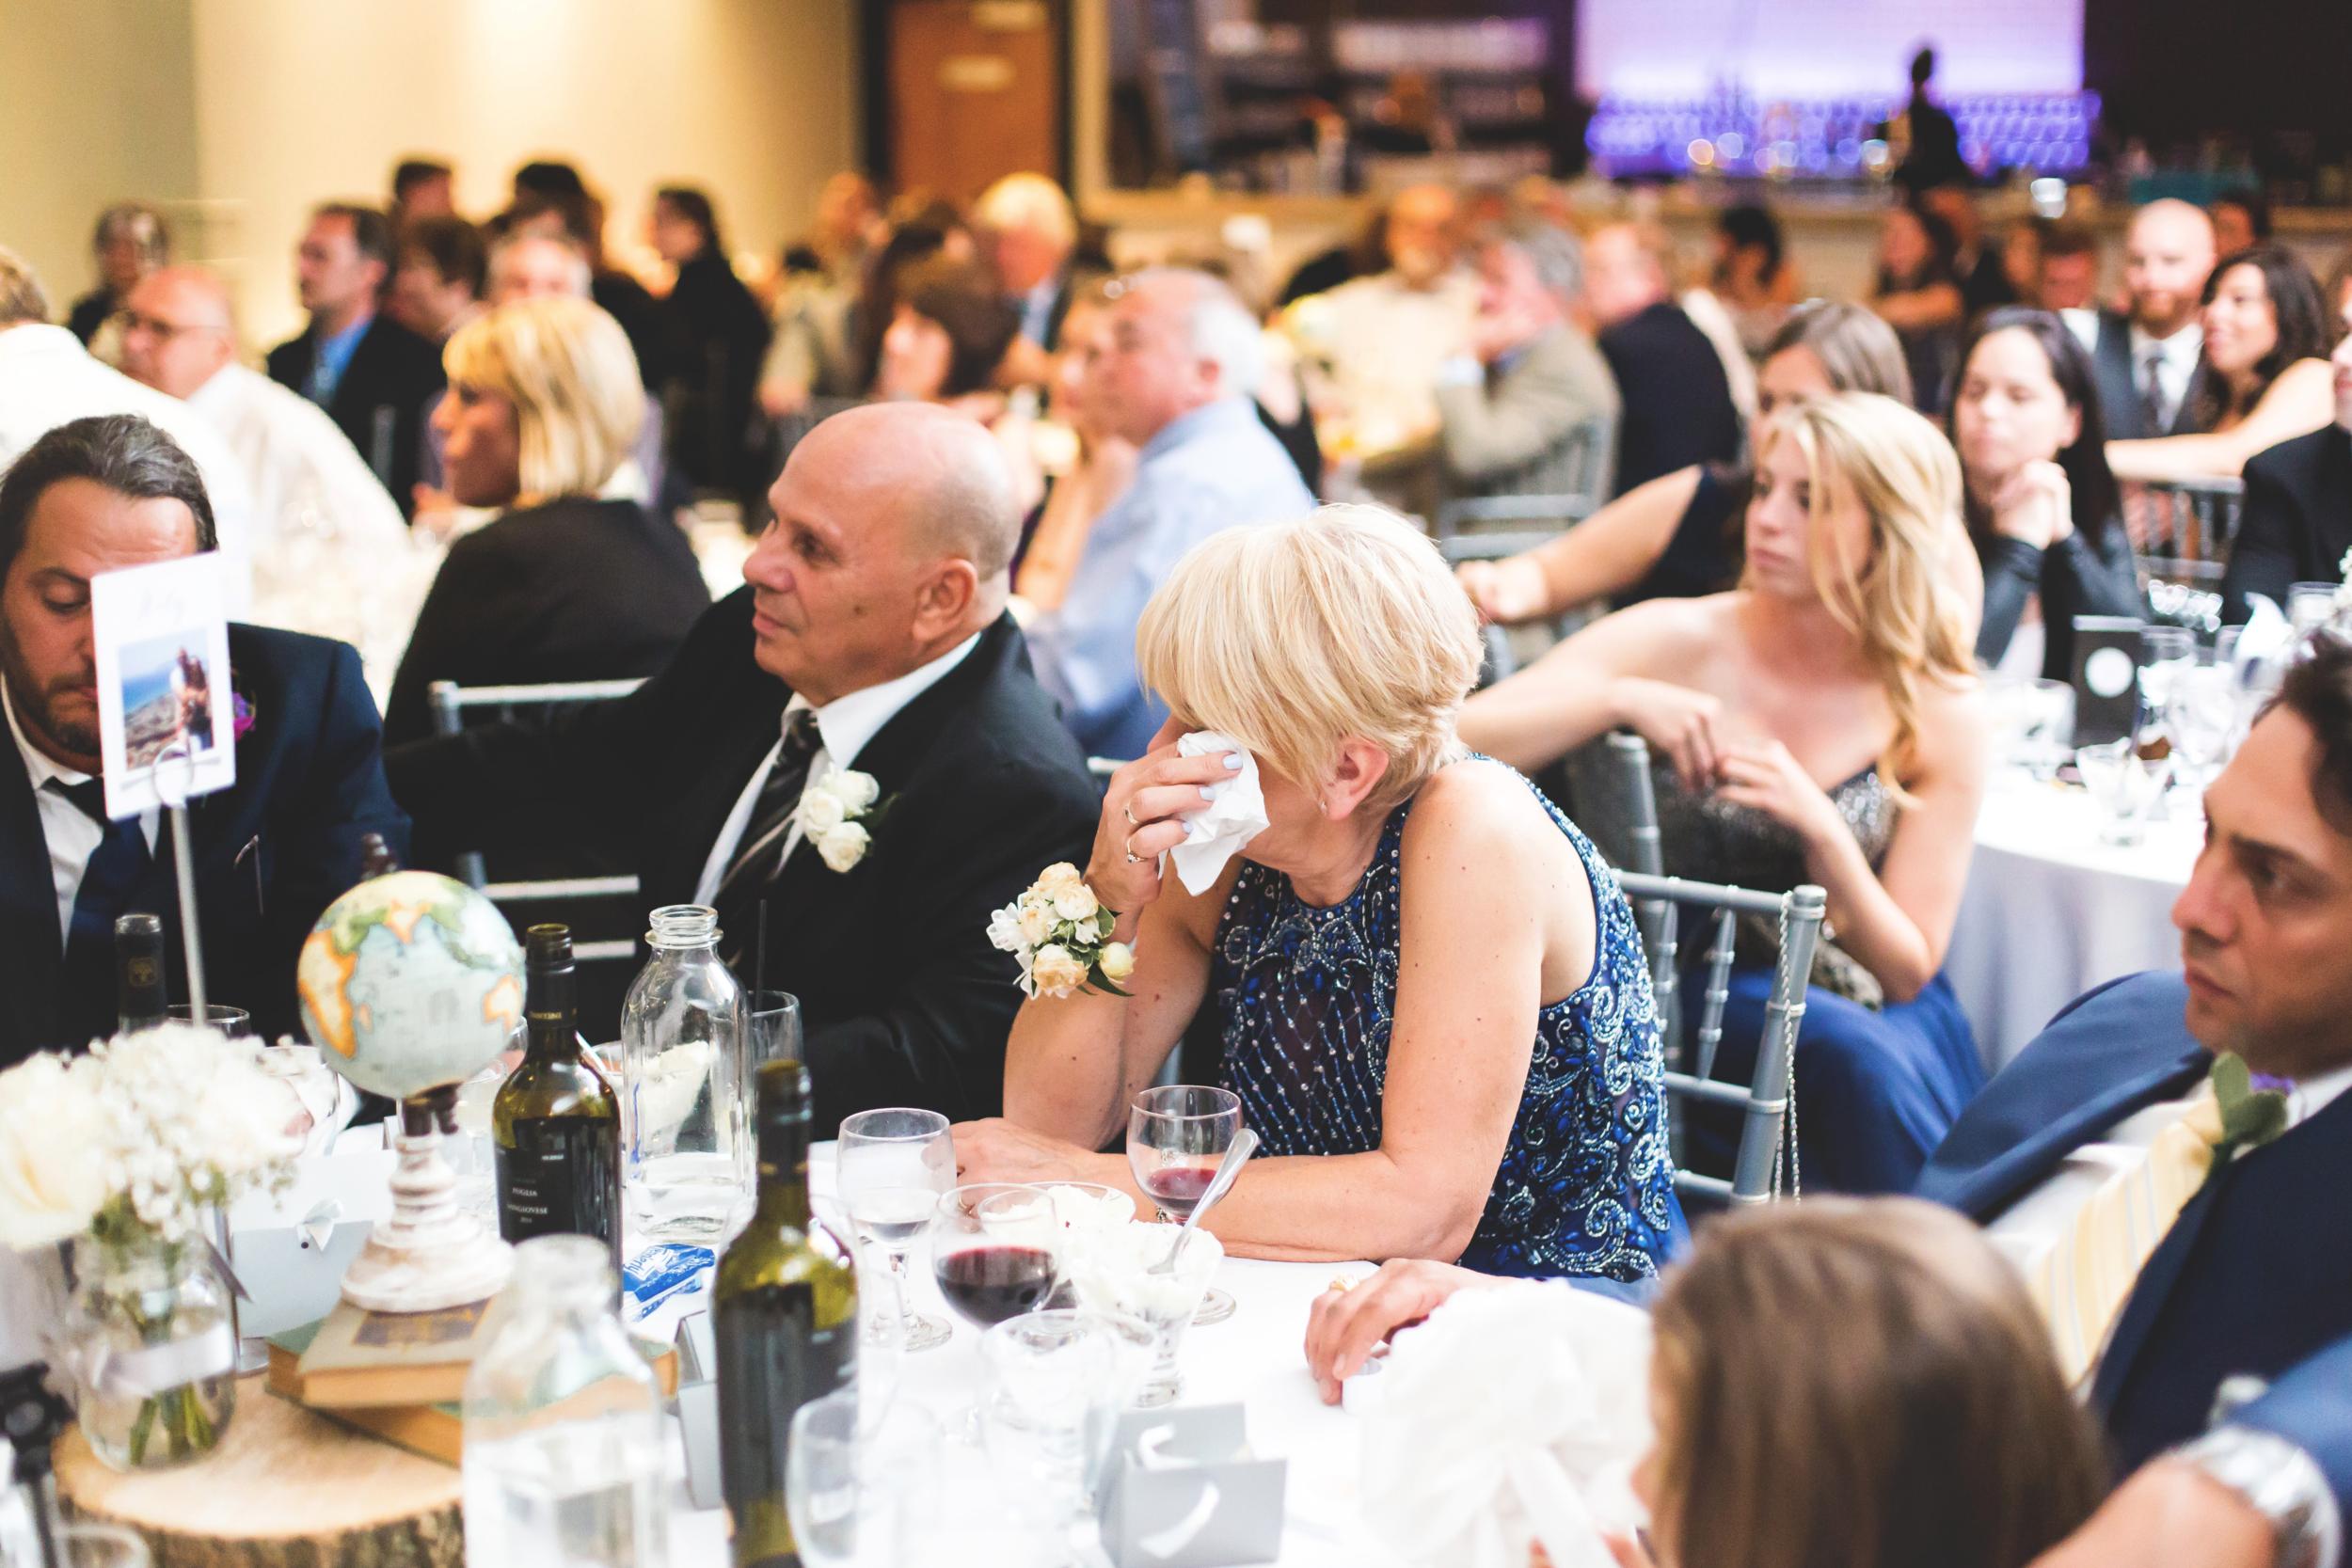 Wedding-Harbour-Banquet-Center-Oakville-Photographer-Wedding-Hamilton-Saint-James-Espresso-Downtown-HamOnt-GTA-Niagara-Toronto-Moments-by-Lauren-Photography-Photo-Image-79.png